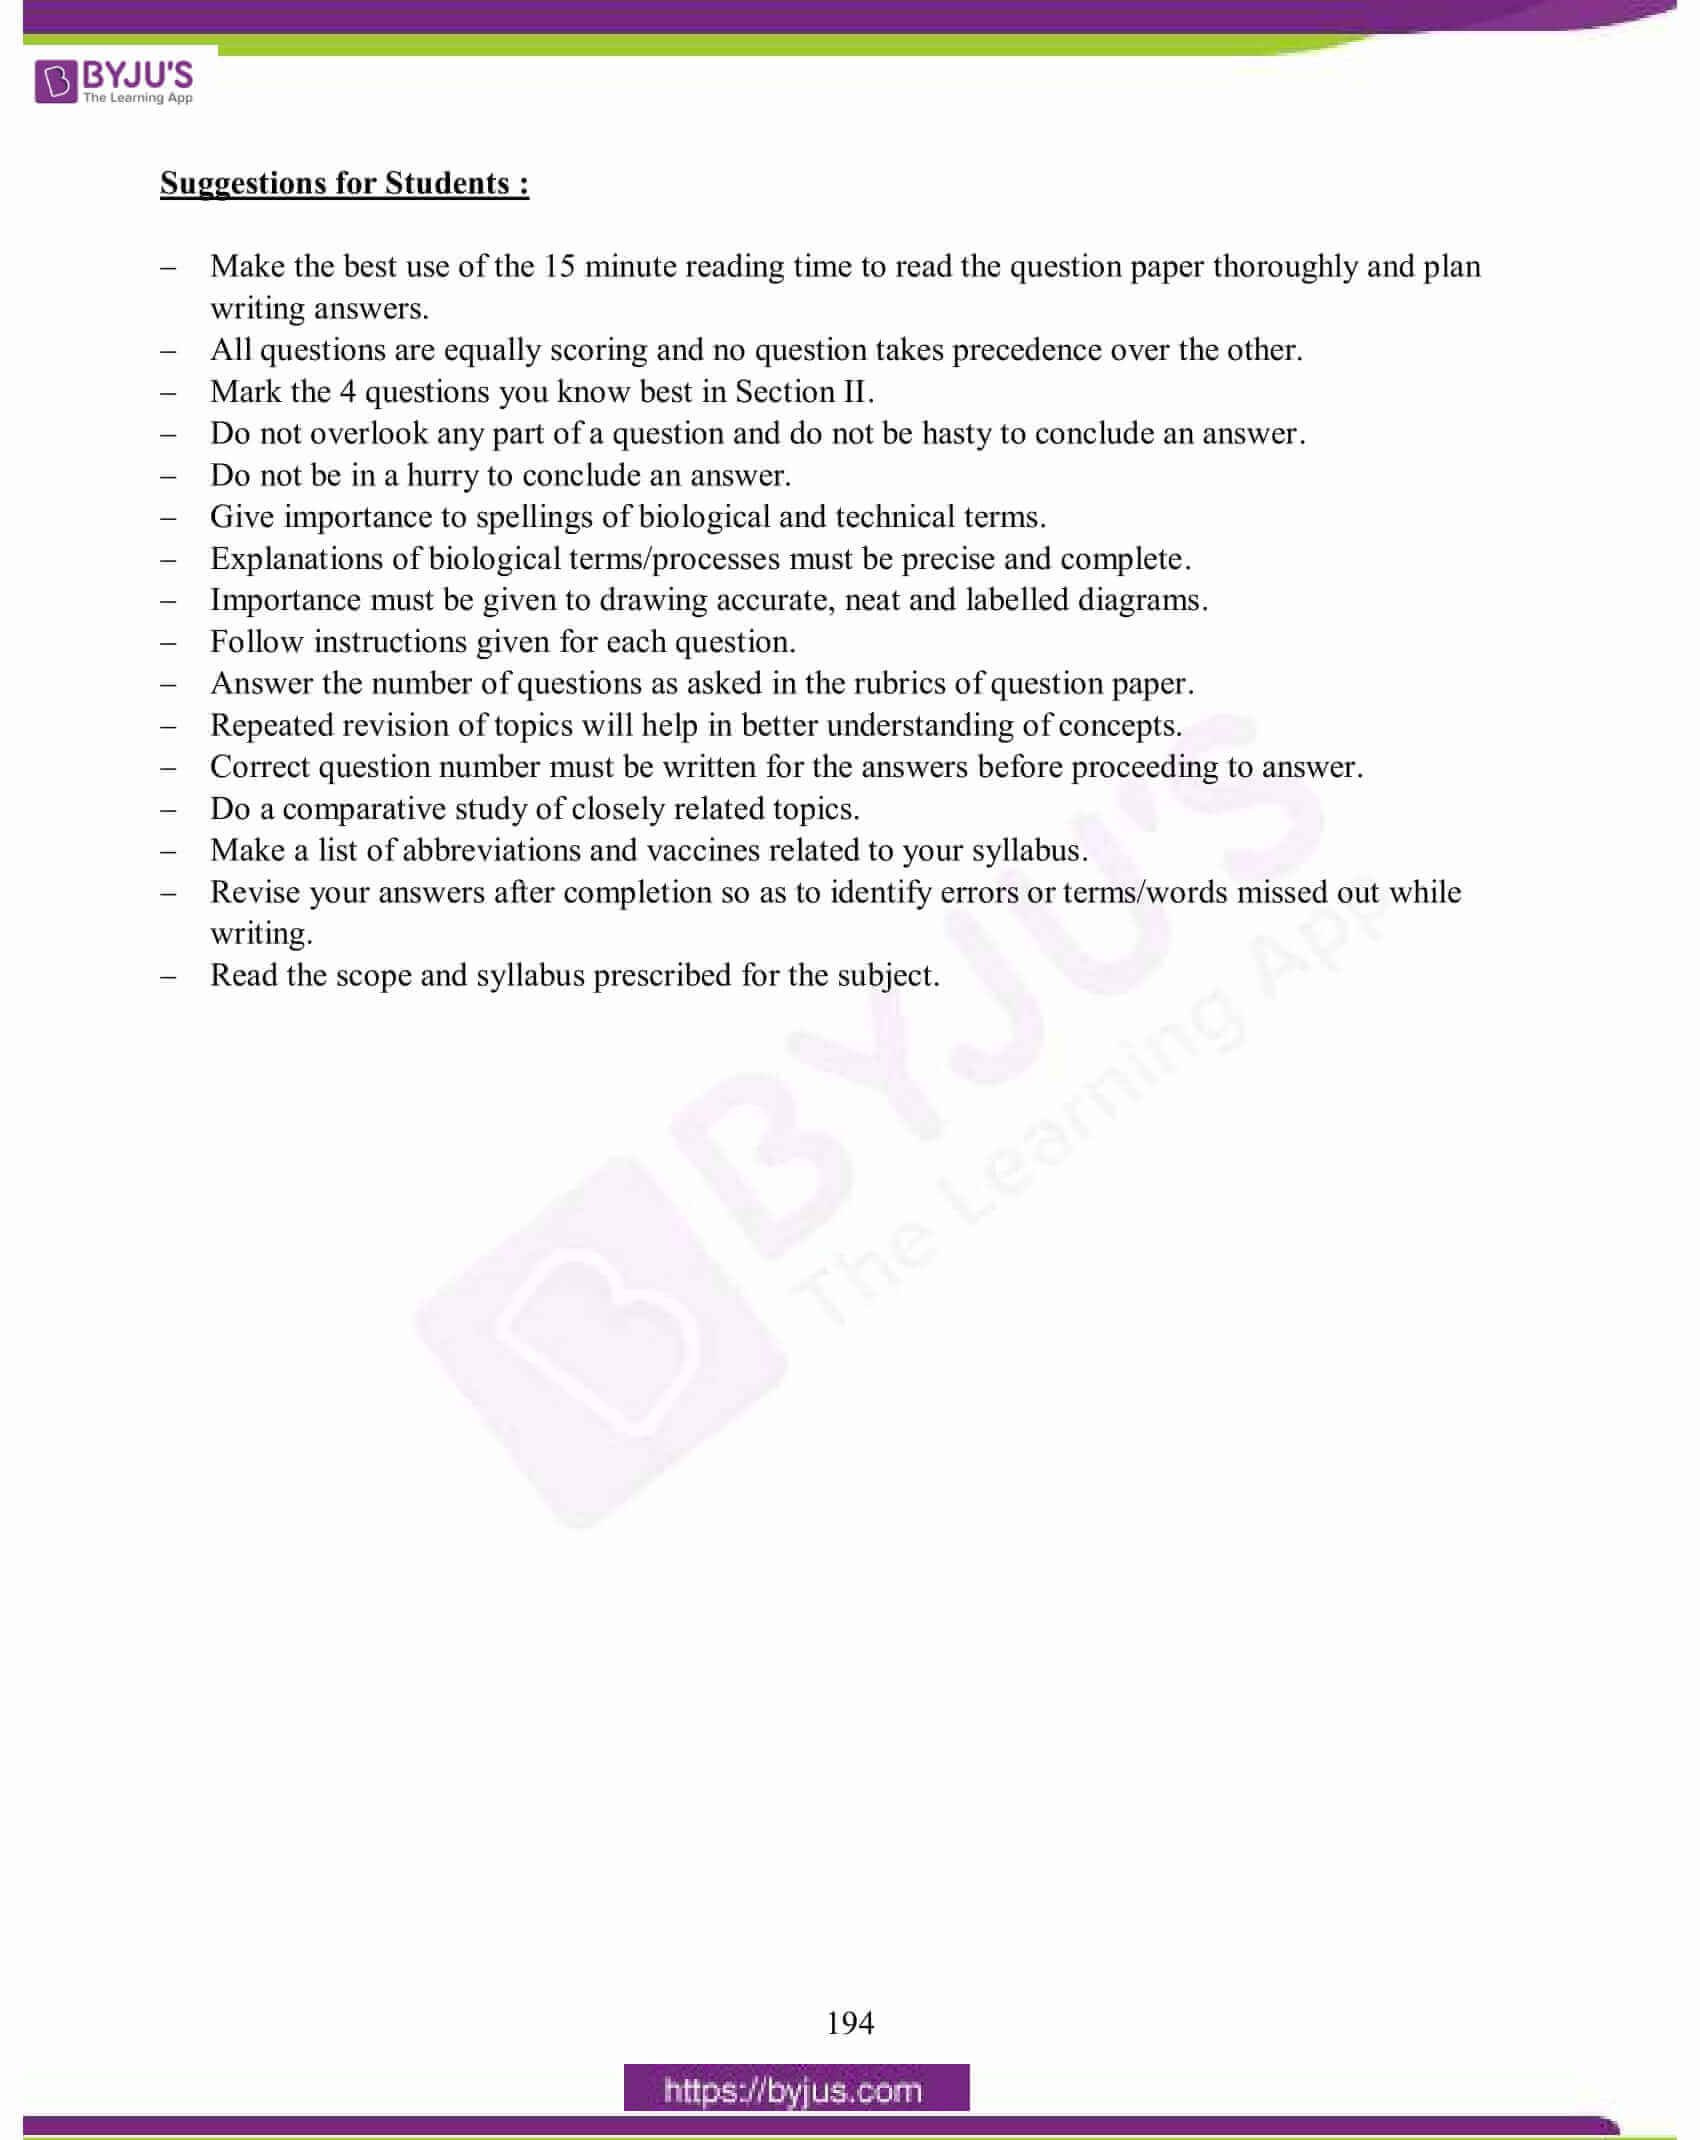 icse class 10 biology question paper solution 2015 21